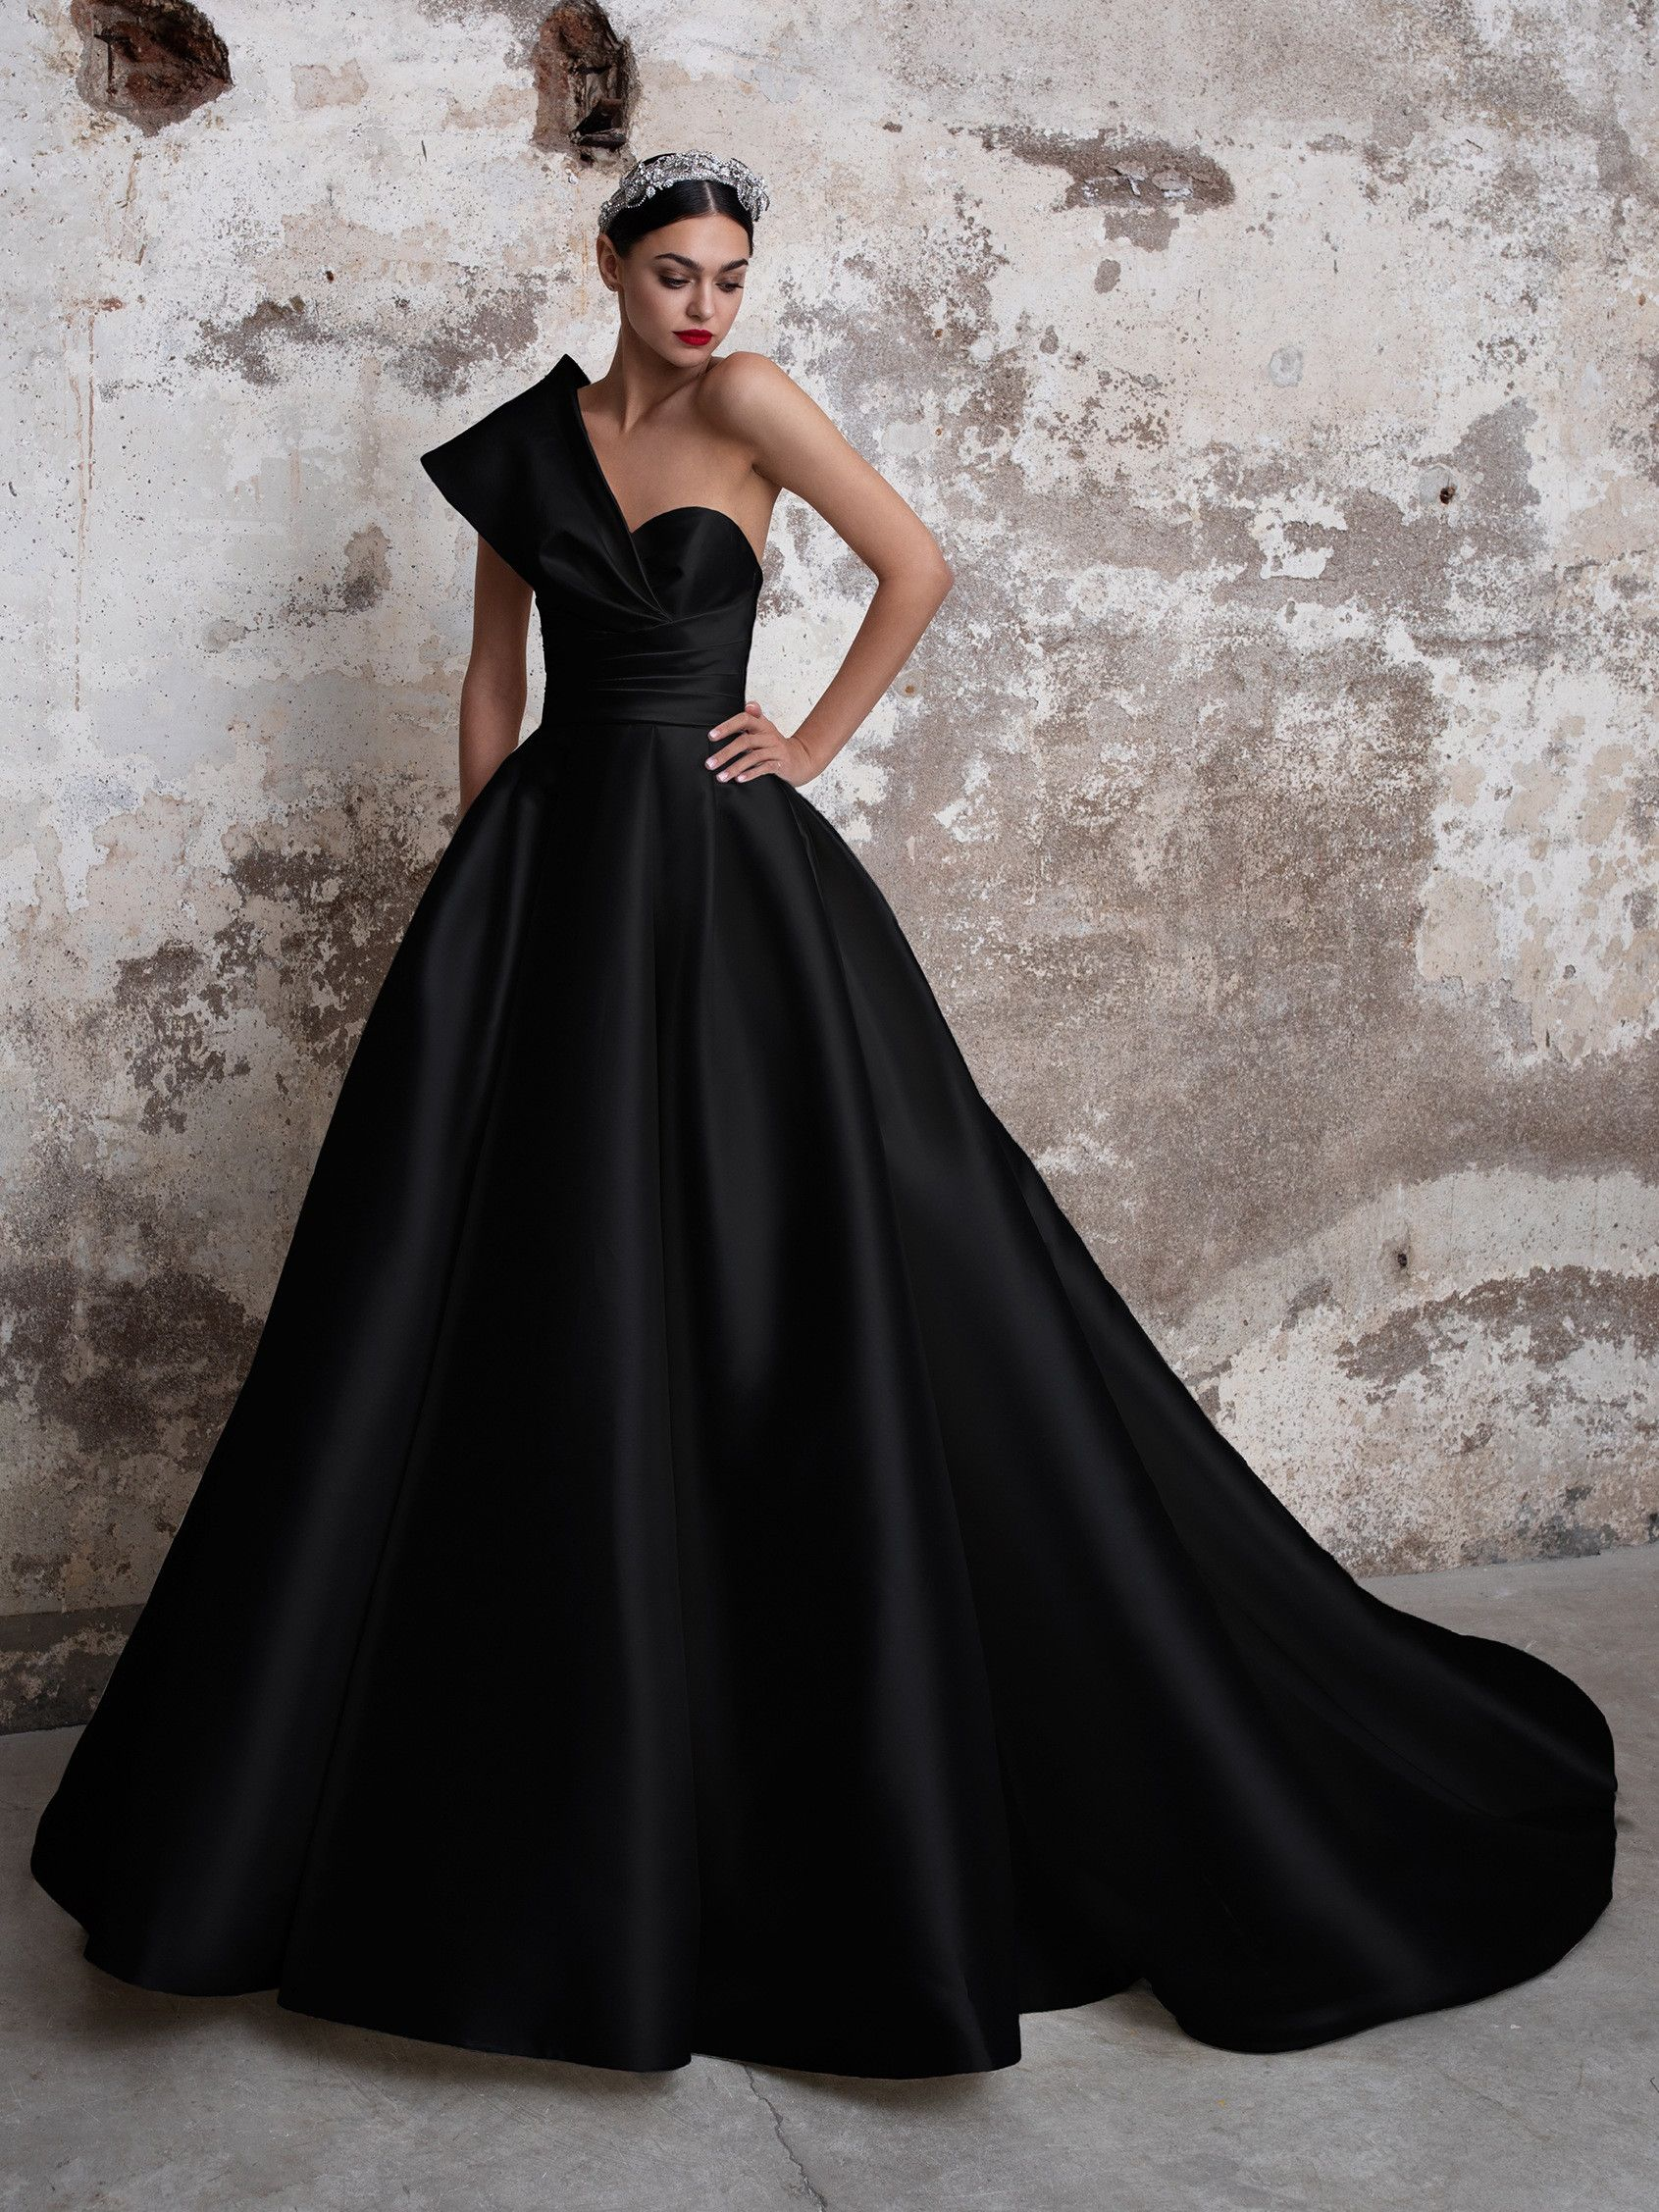 Tourmaline Black Wedding Gowns Pronovias Wedding Dress Princess Wedding Dresses [ 2255 x 1691 Pixel ]